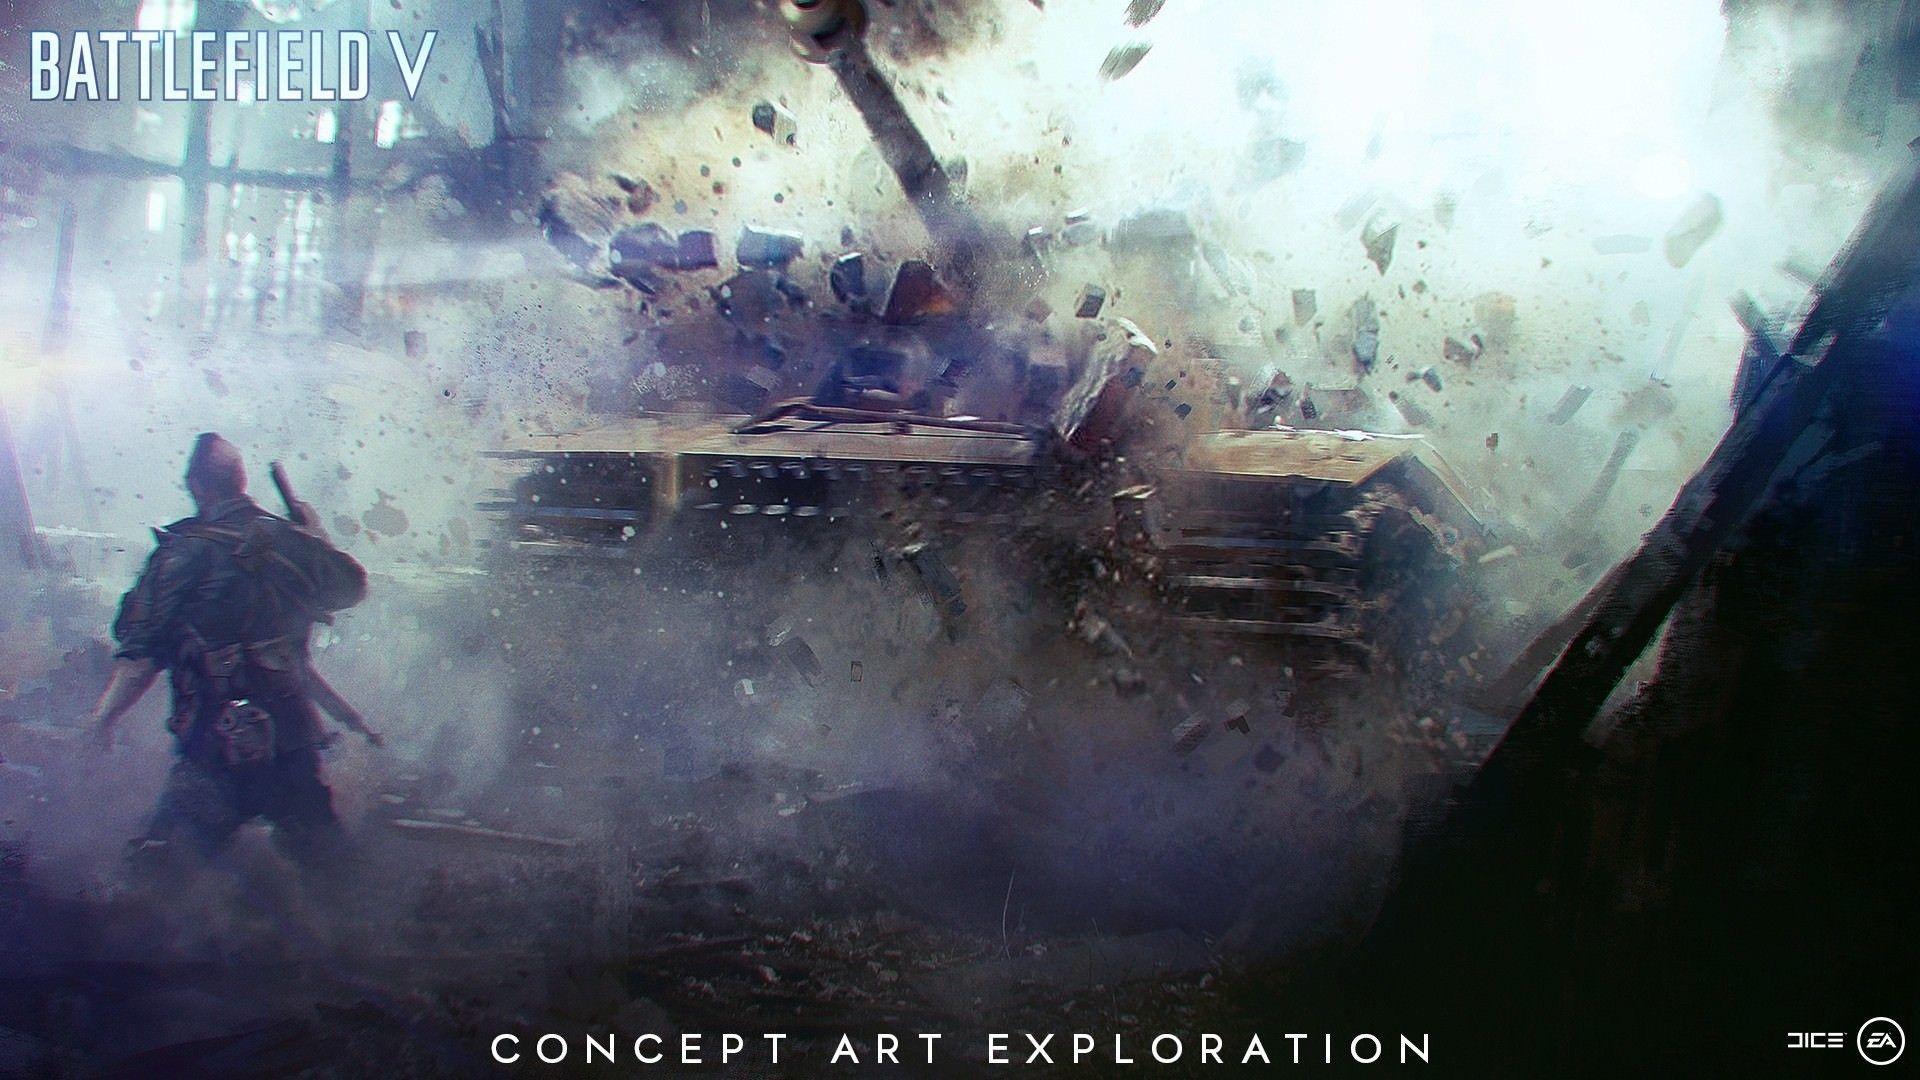 Battlefield 5 Battlefield V Anime Wallpaper Battlefield